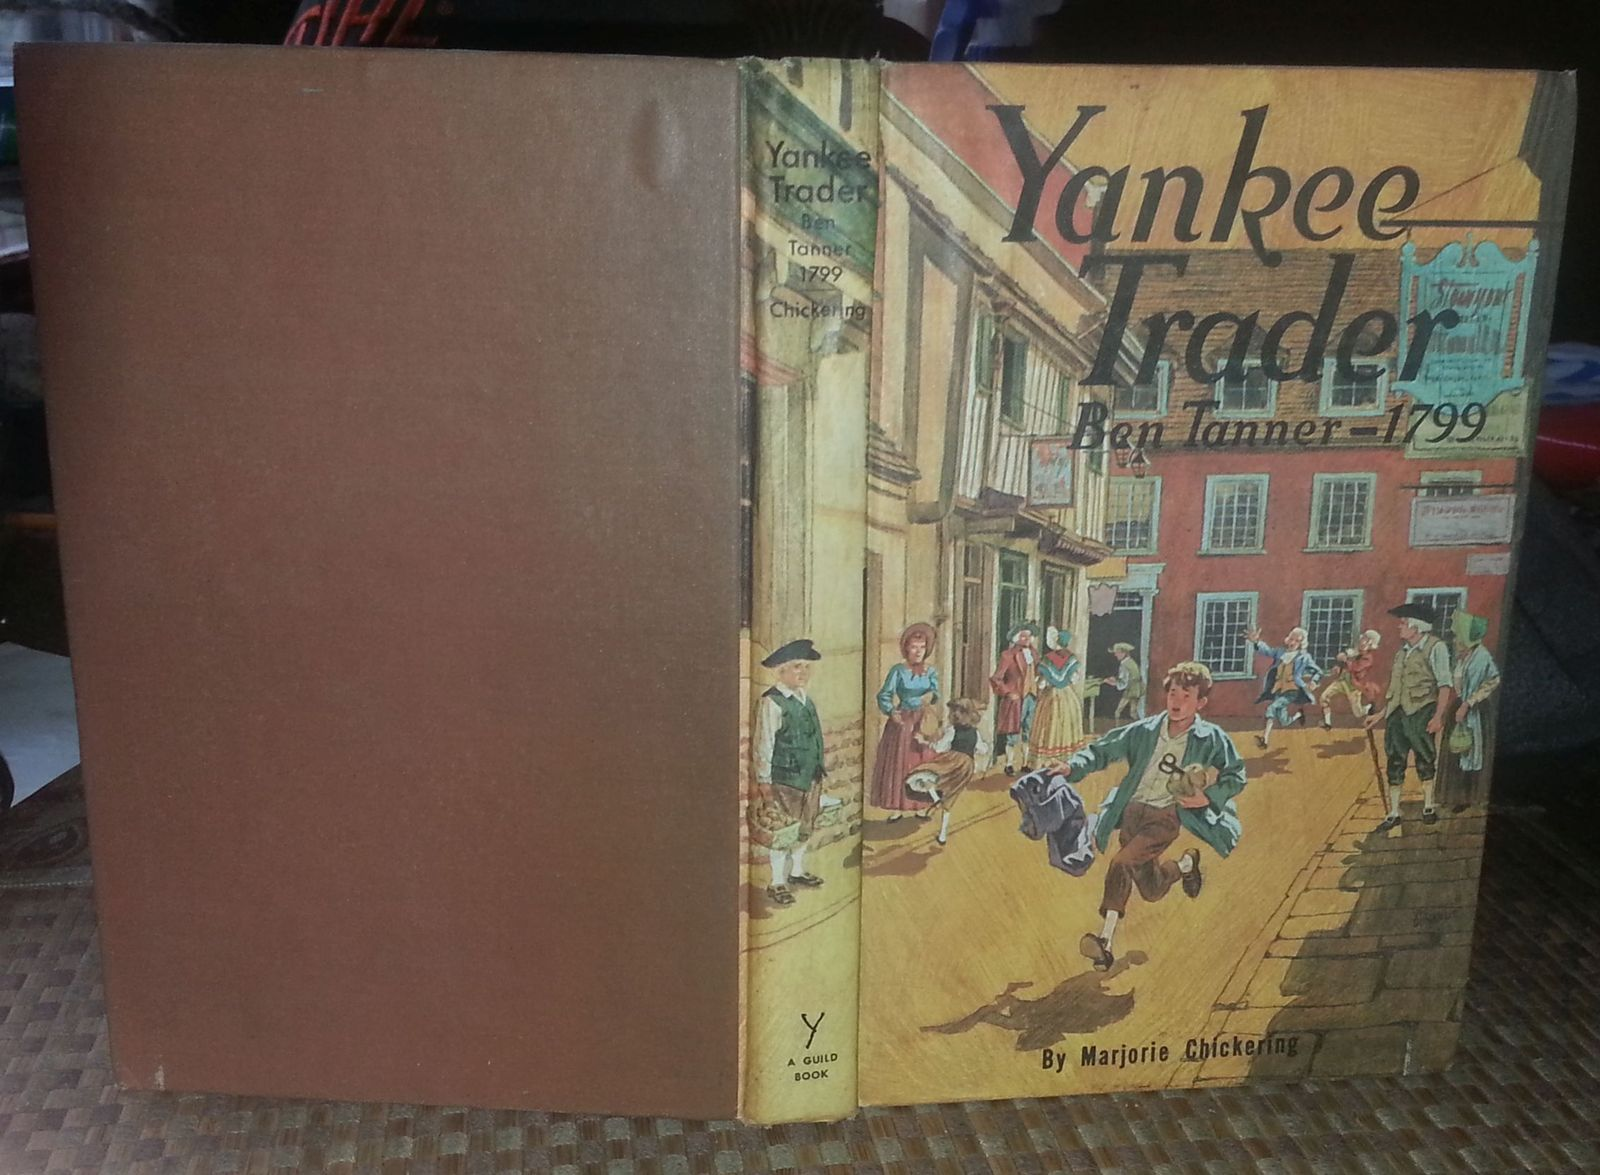 Yankee Trader by Marjorie Chickering 1966 HB St. Johnsbury Vermont 1799